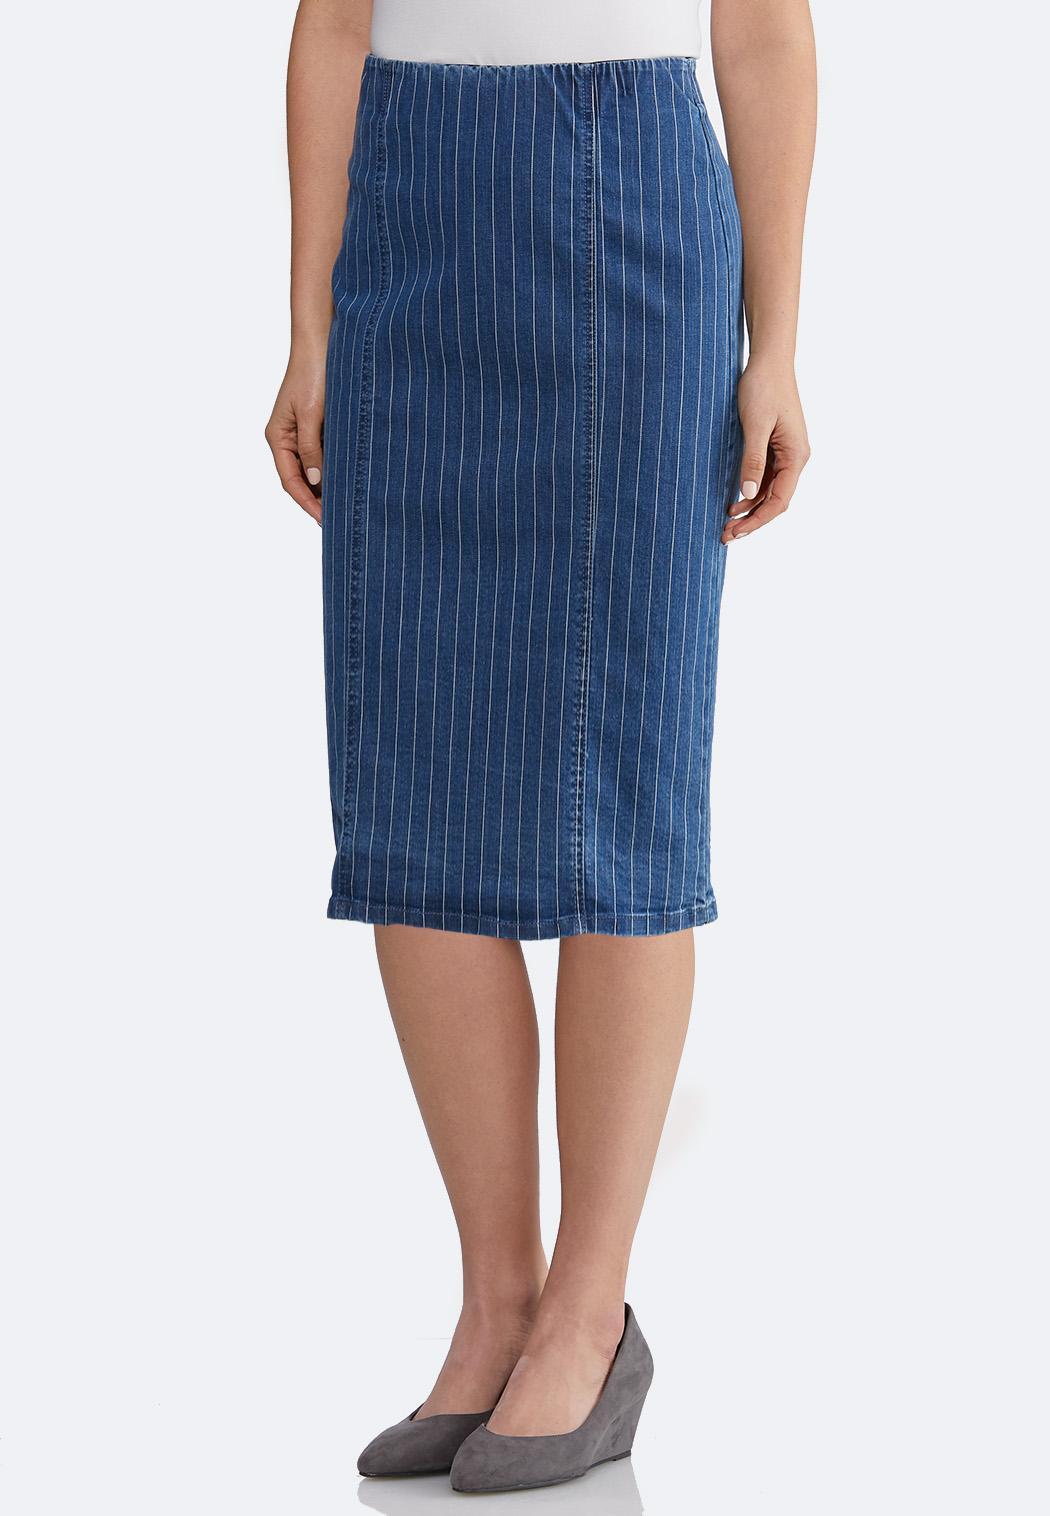 2c328f8240 Plus Size Striped Denim Pencil Skirt Skirts Cato Fashions